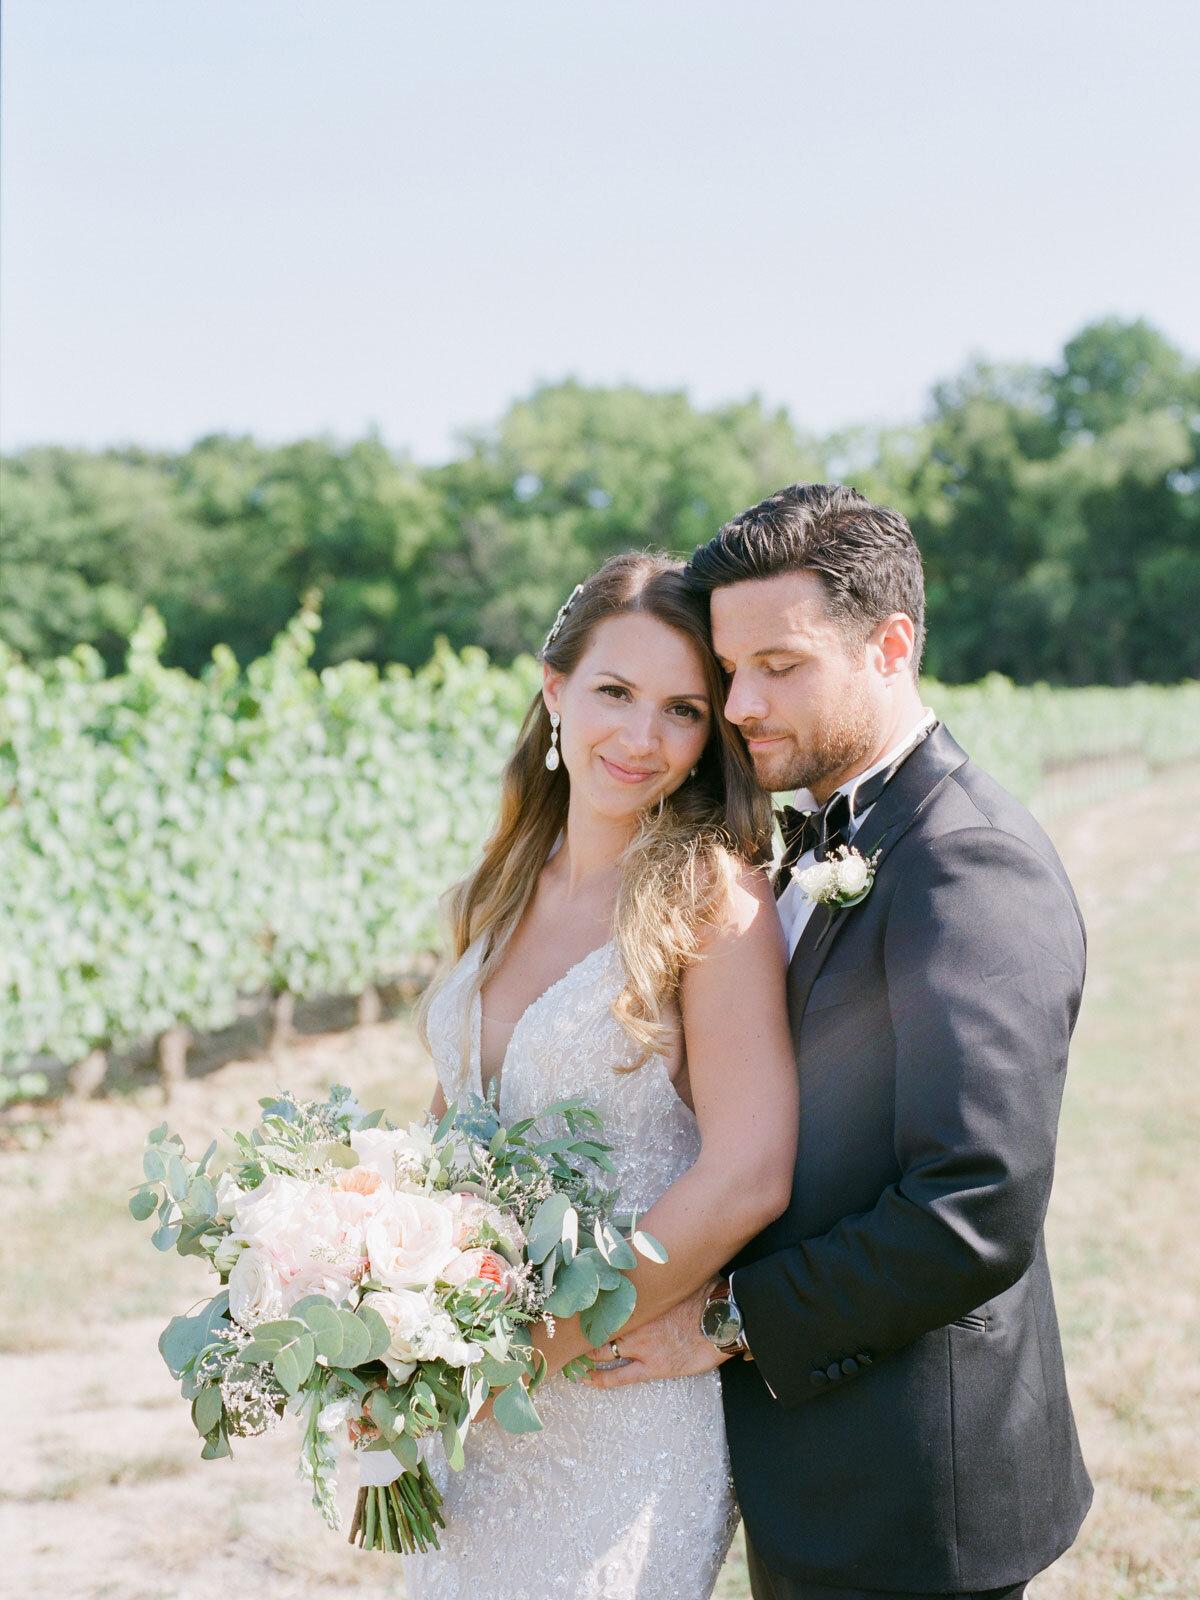 Chateau-des-Charmes-Wedding-Summer-Vineyard-Bride-Niagara-on-the-Lake-photos-by-Gemini-Photography-Ontario-0043.jpg